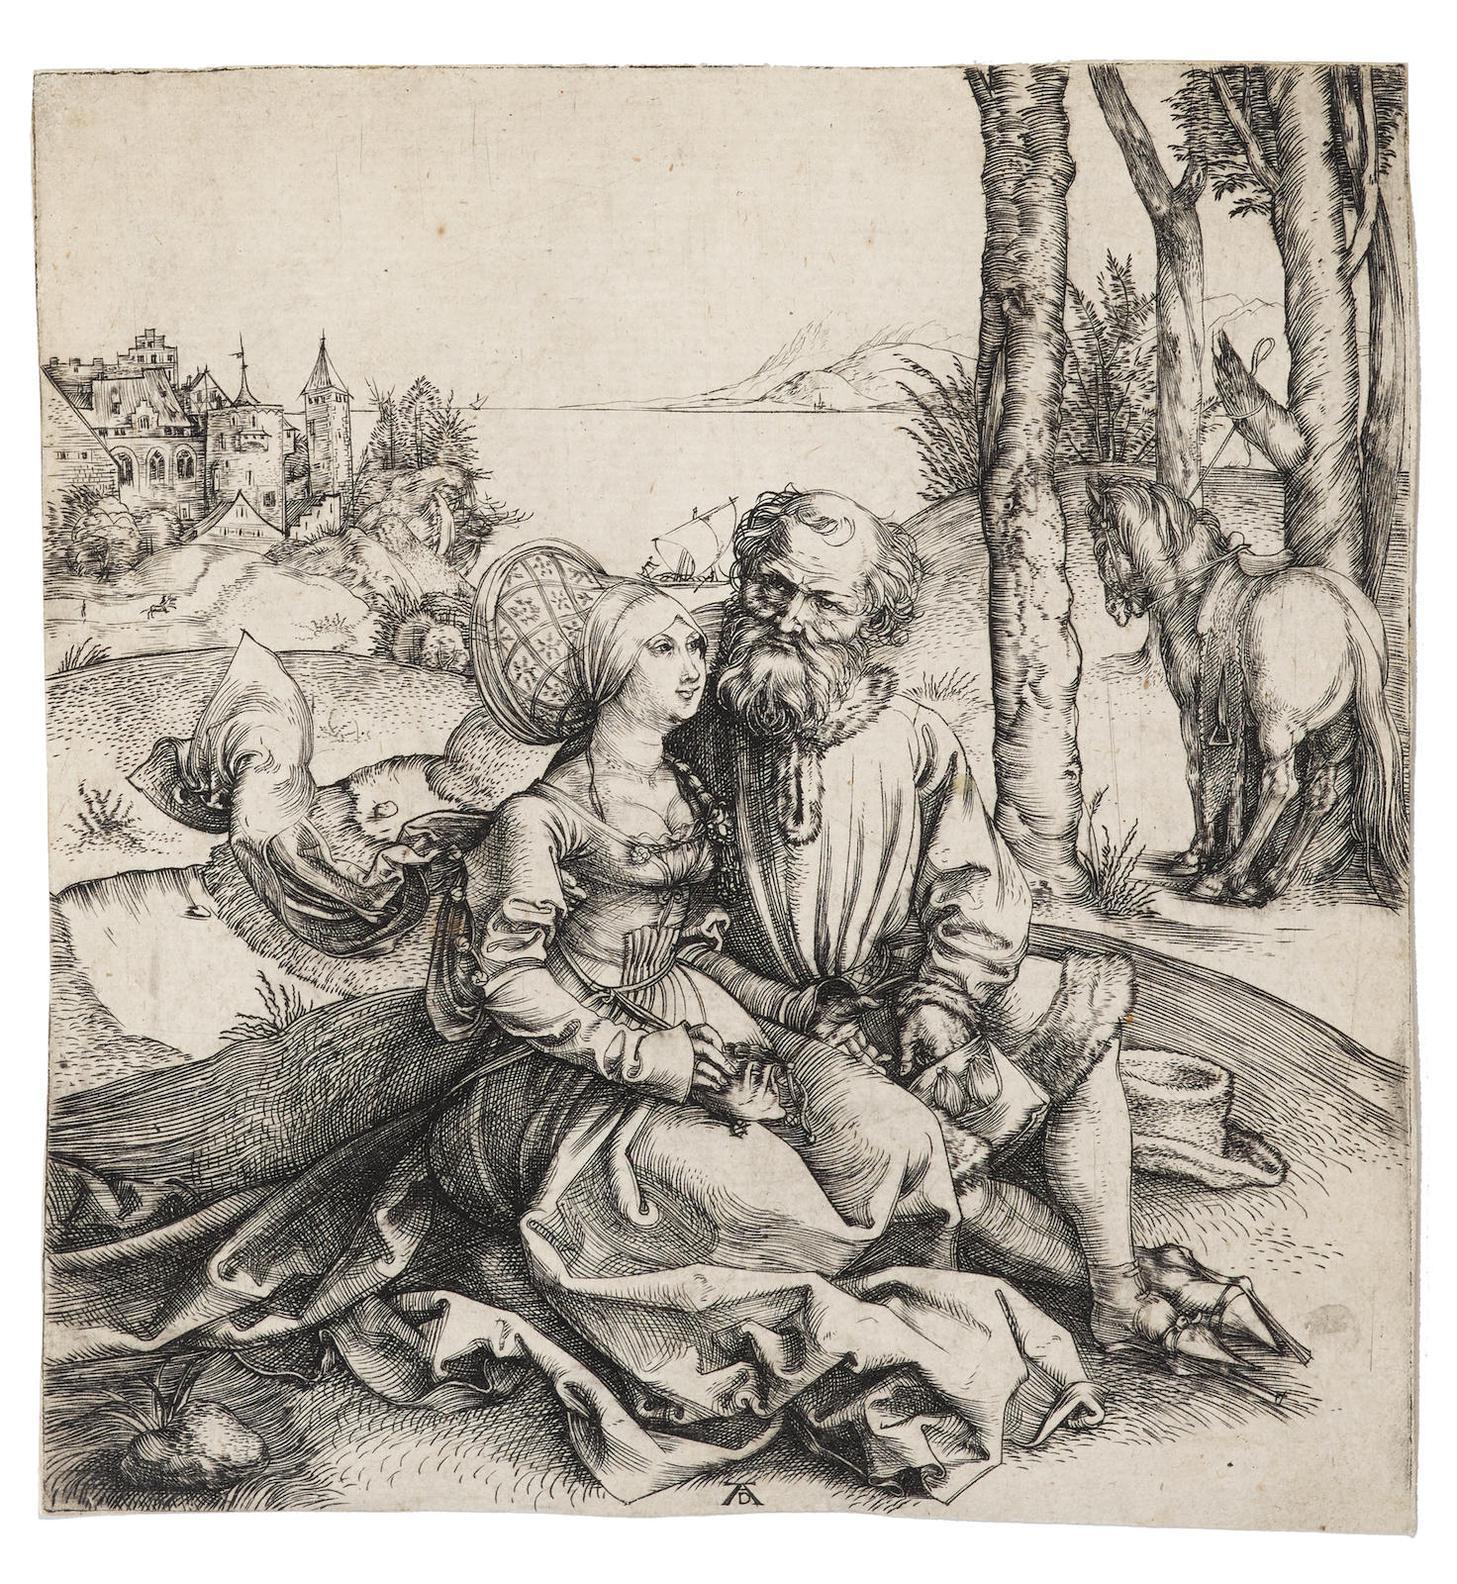 Albrecht Durer-The Ill-Assorted Couple (B. 93; M., Holl. 77; S.M.S. 3)-1495